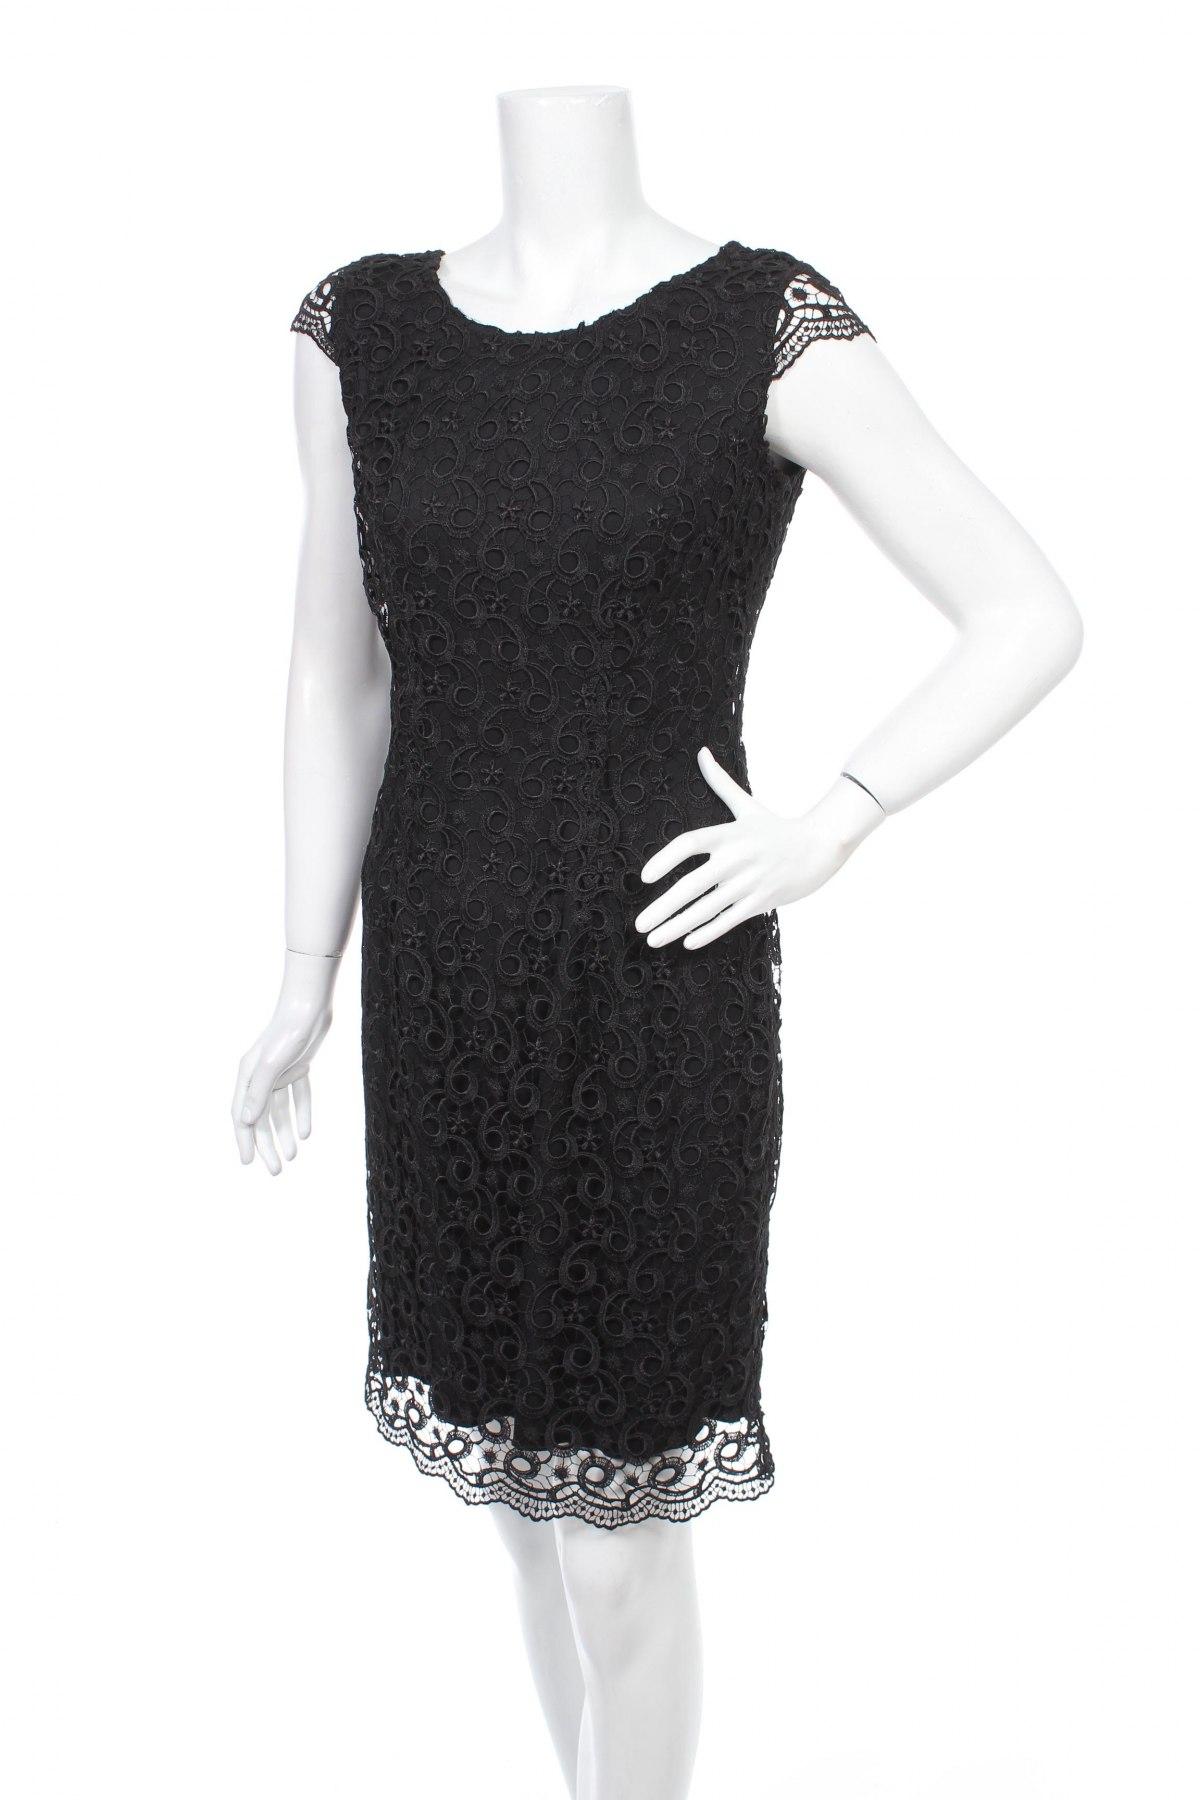 e4f8c47e3f7 Φόρεμα S.Oliver - σε συμφέρουσα τιμή στο Remix - #104818541